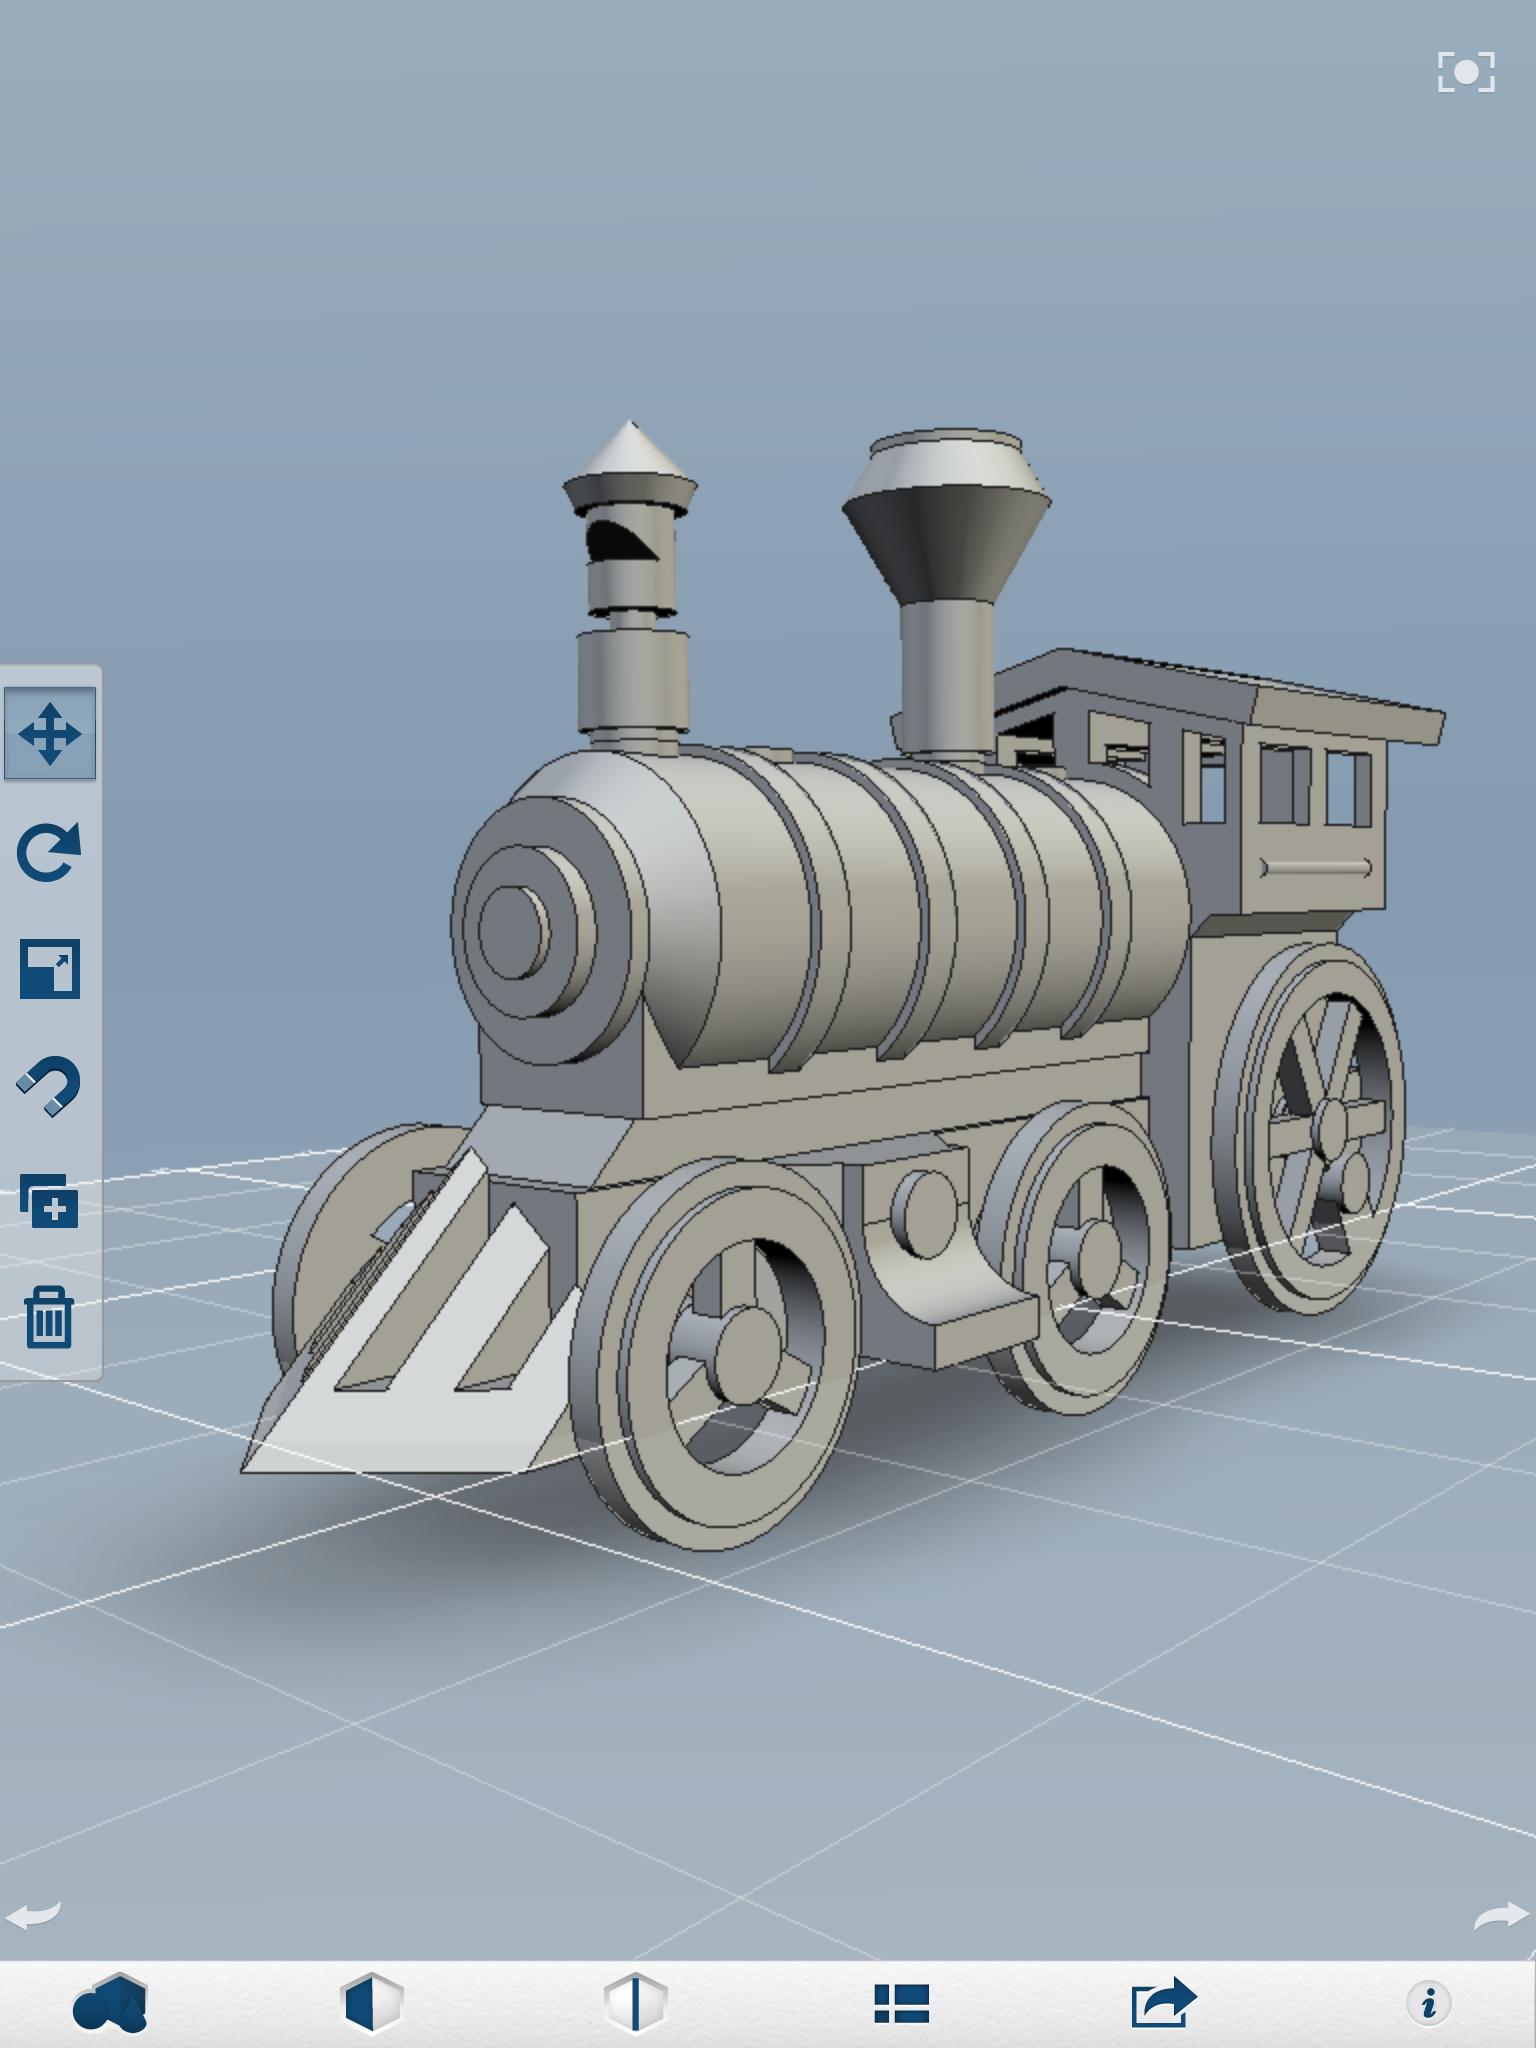 Autodesk 39 s 123d design turns everyone into 3d designers for 3d design app